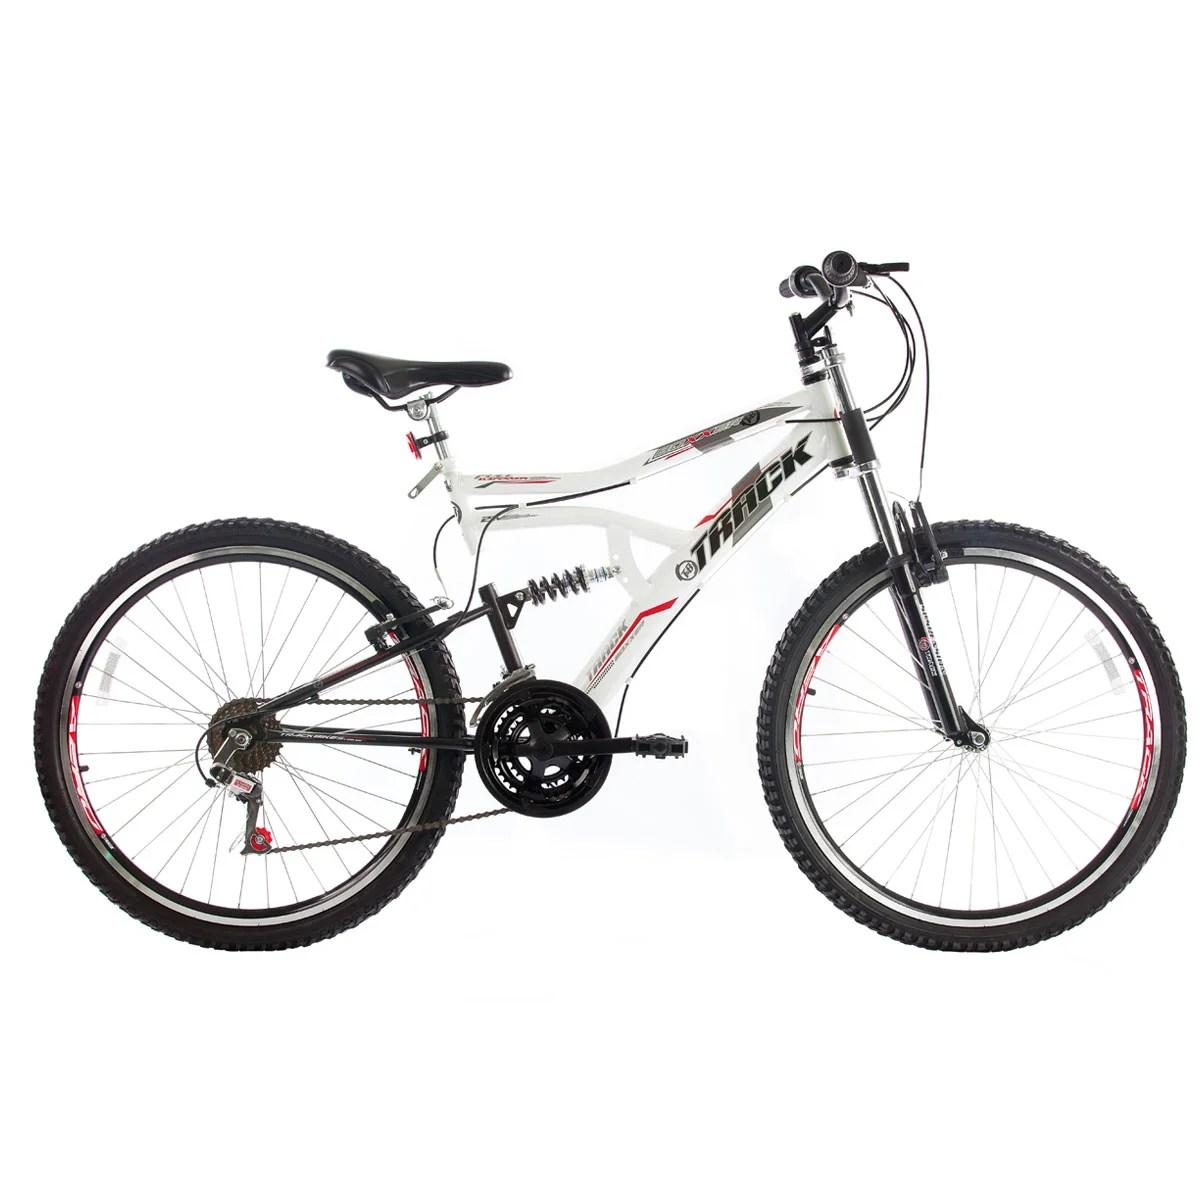 Bicicleta Track Bikes Boxxer C Dupla Suspensao